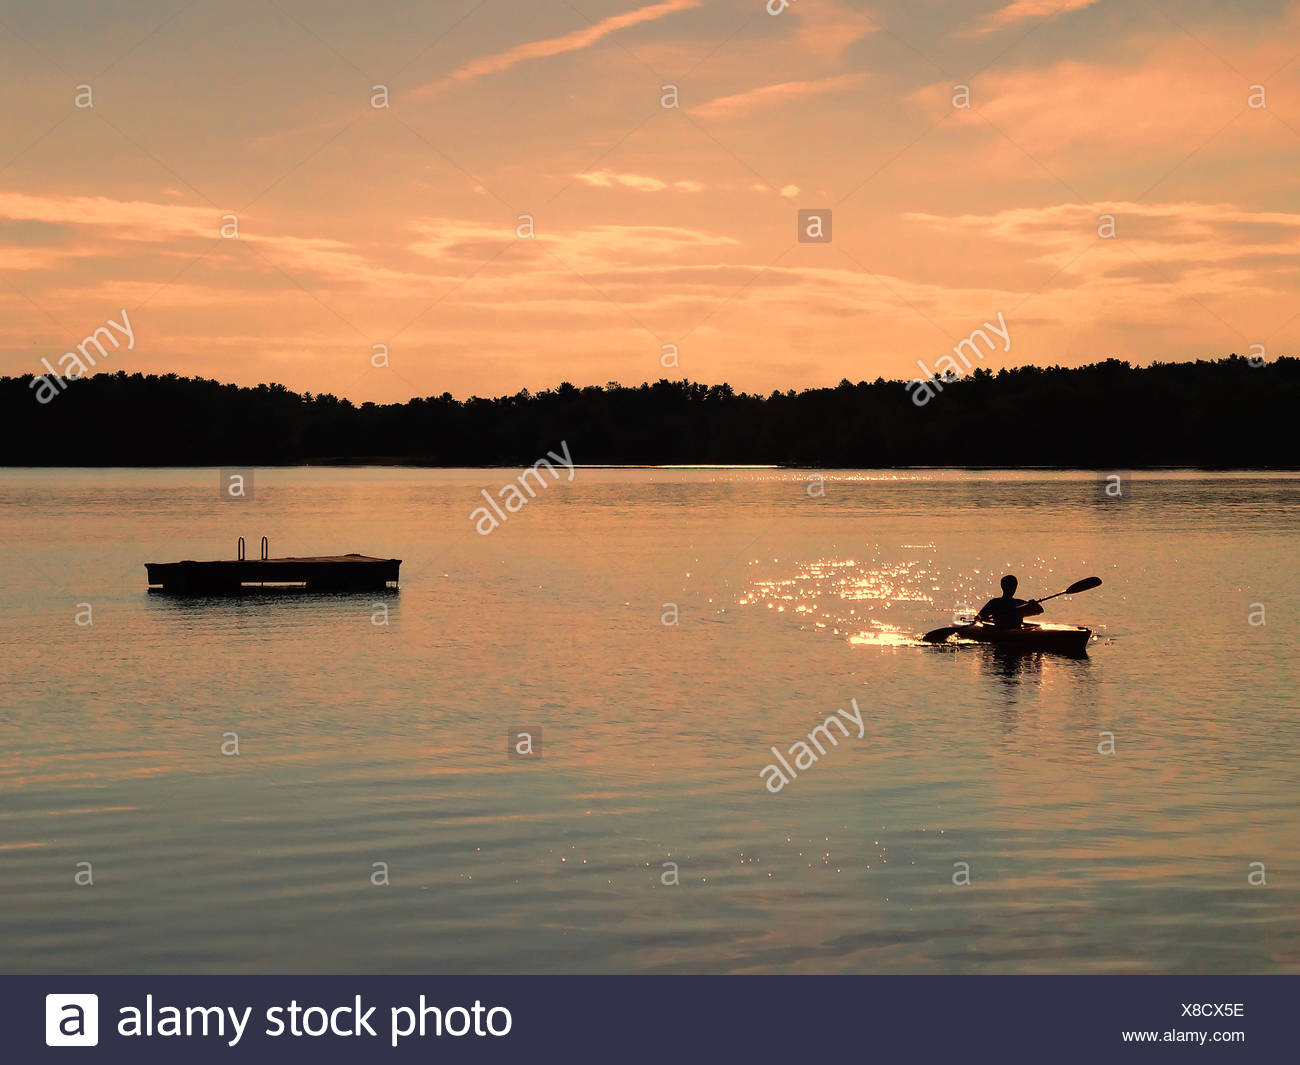 USA, New York State, Sullivan, Kayaking at sunset Stock Photo